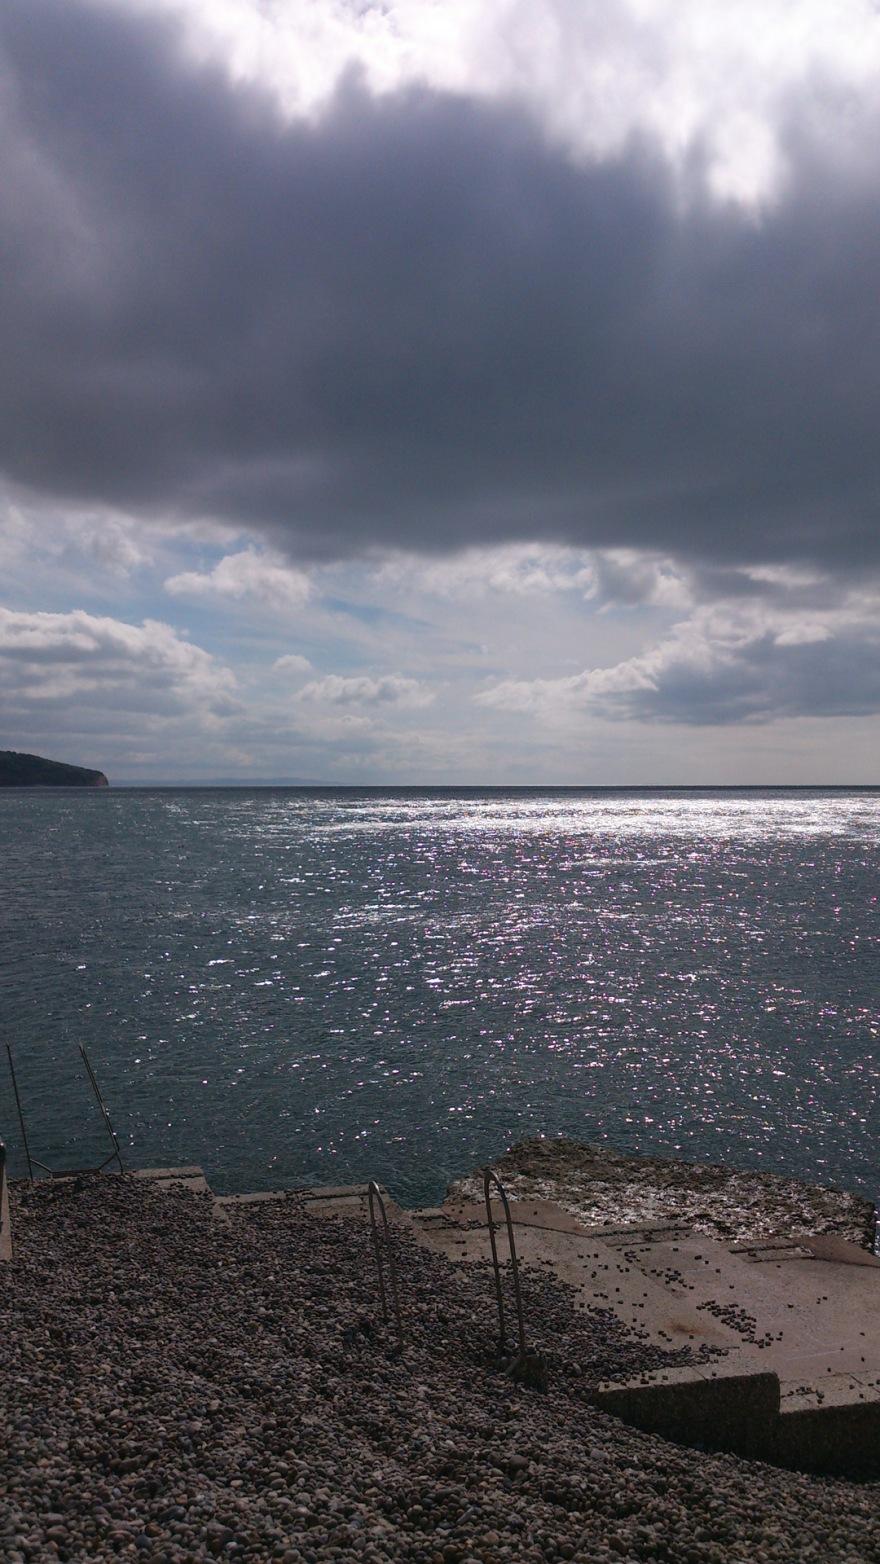 A shimmering horizon